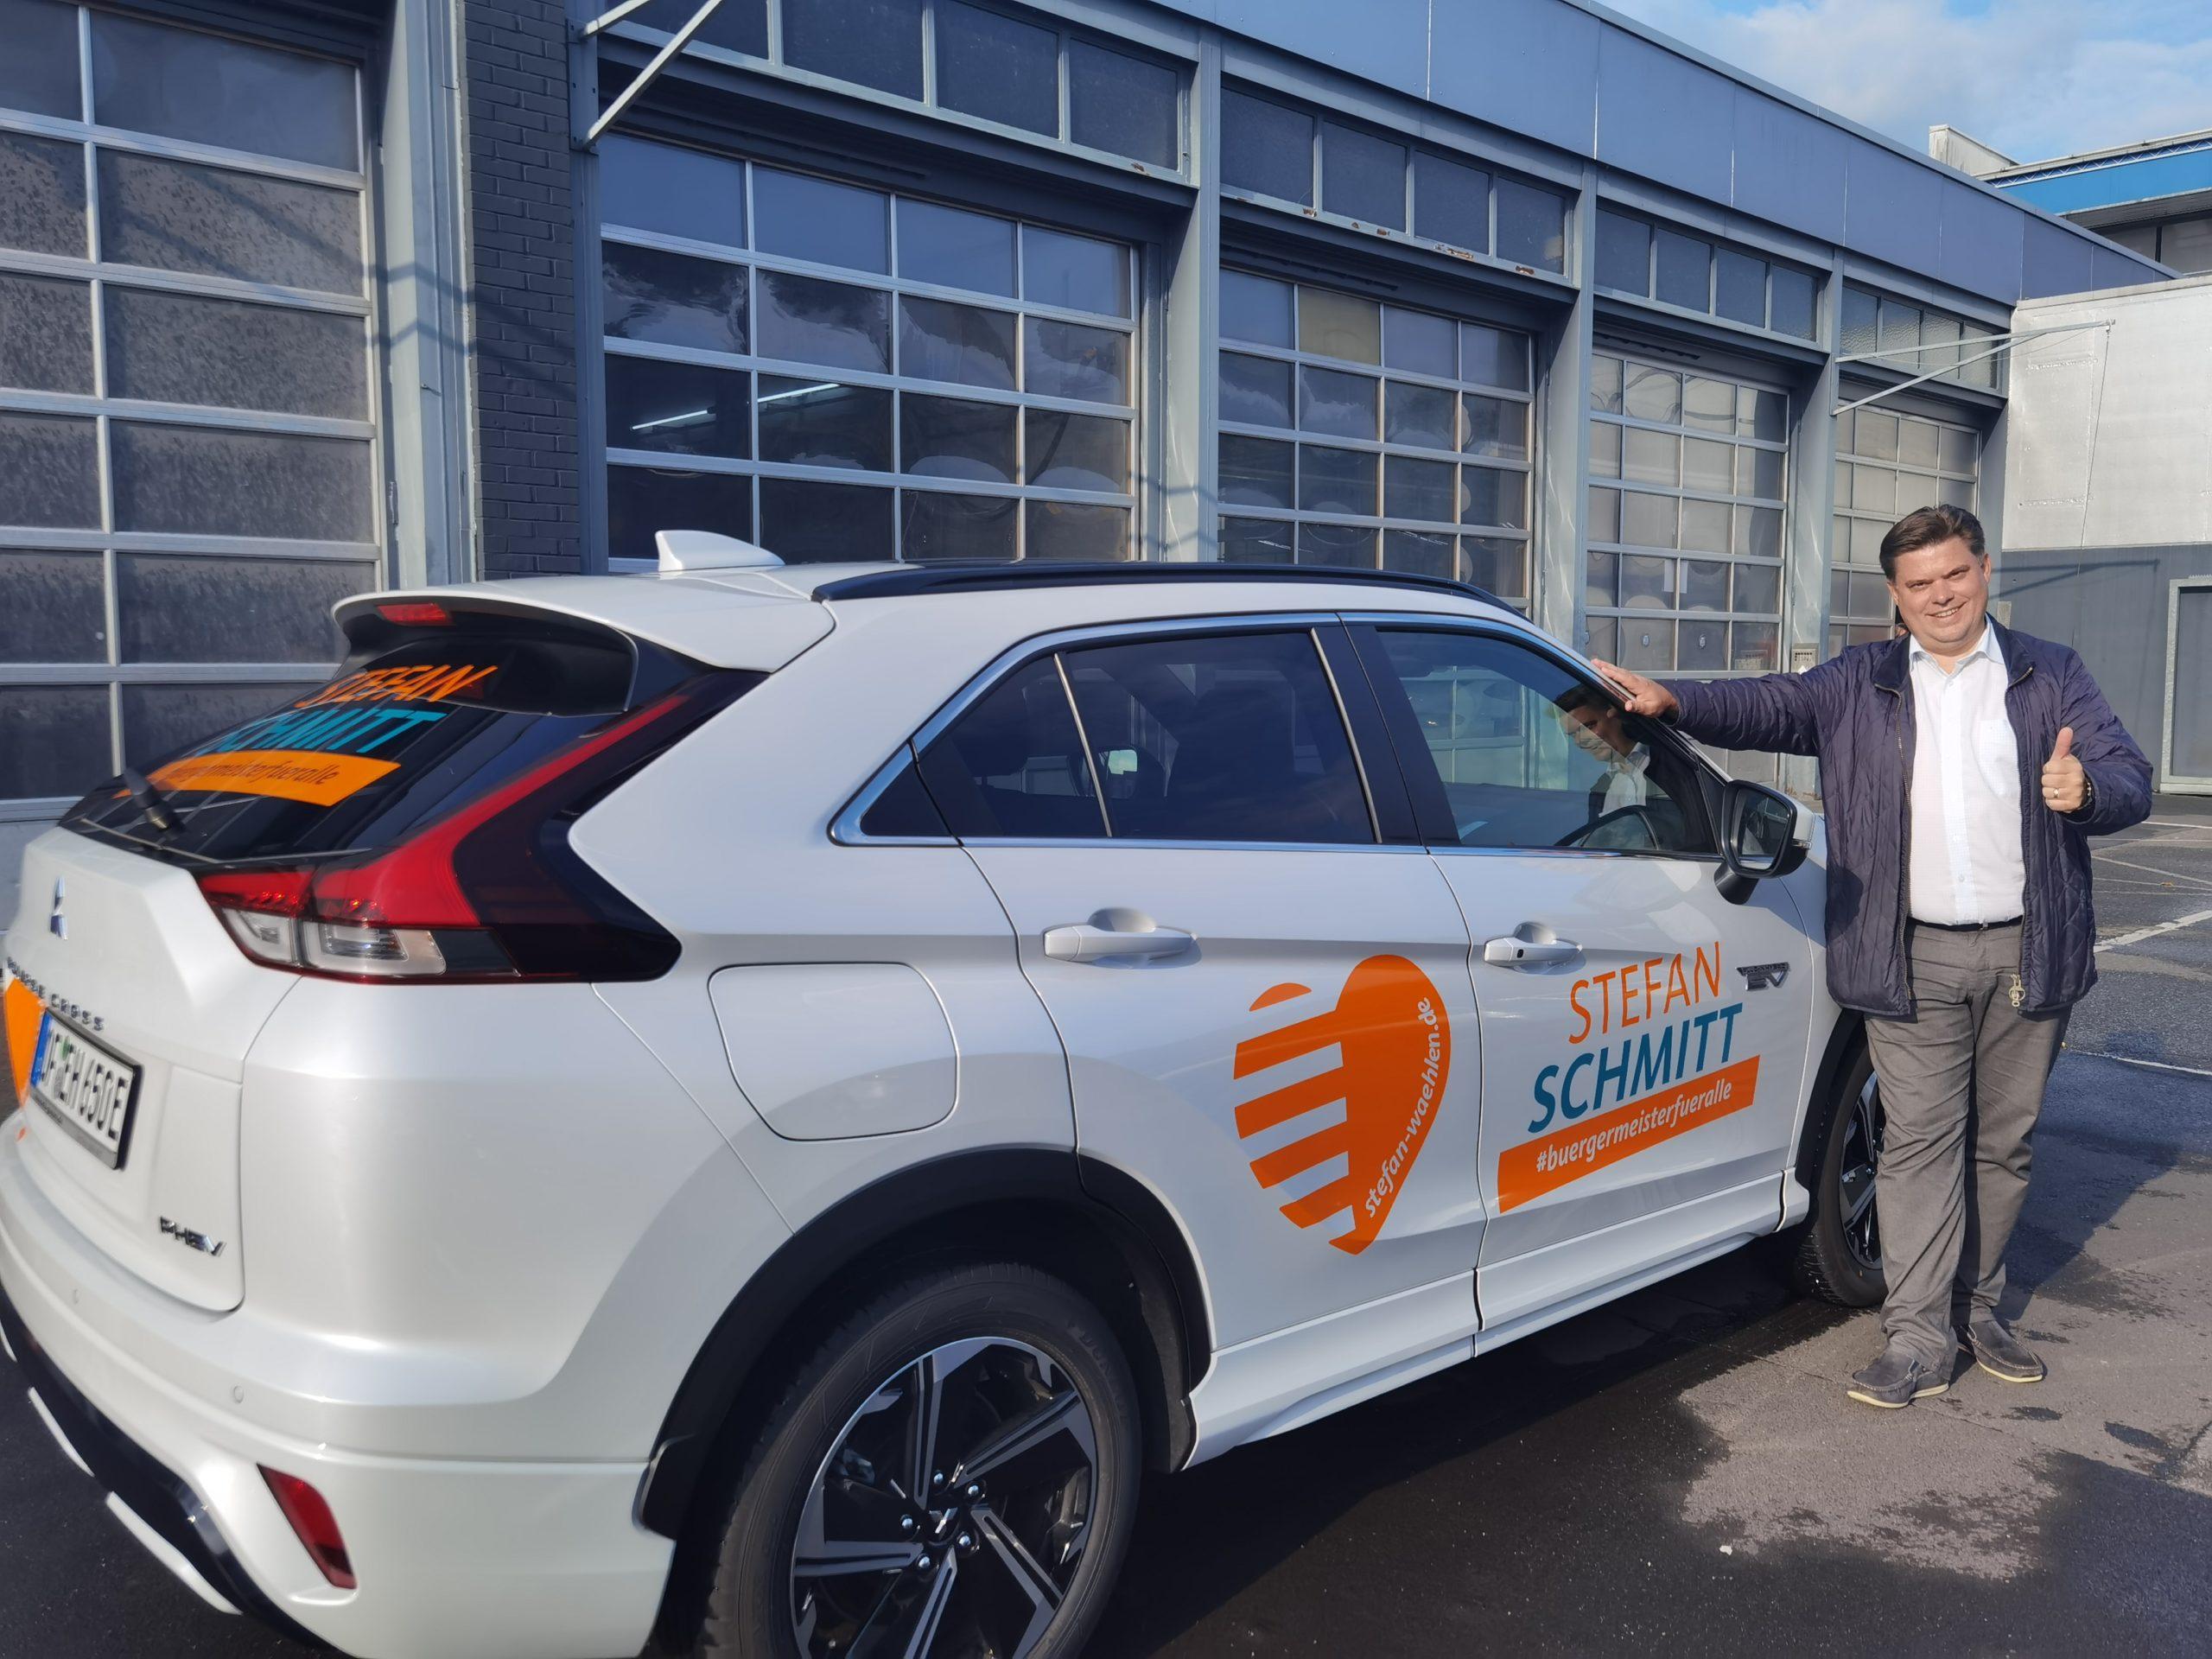 Stefan Schmitt mit hybridem Wahlkampfmobil unterwegs